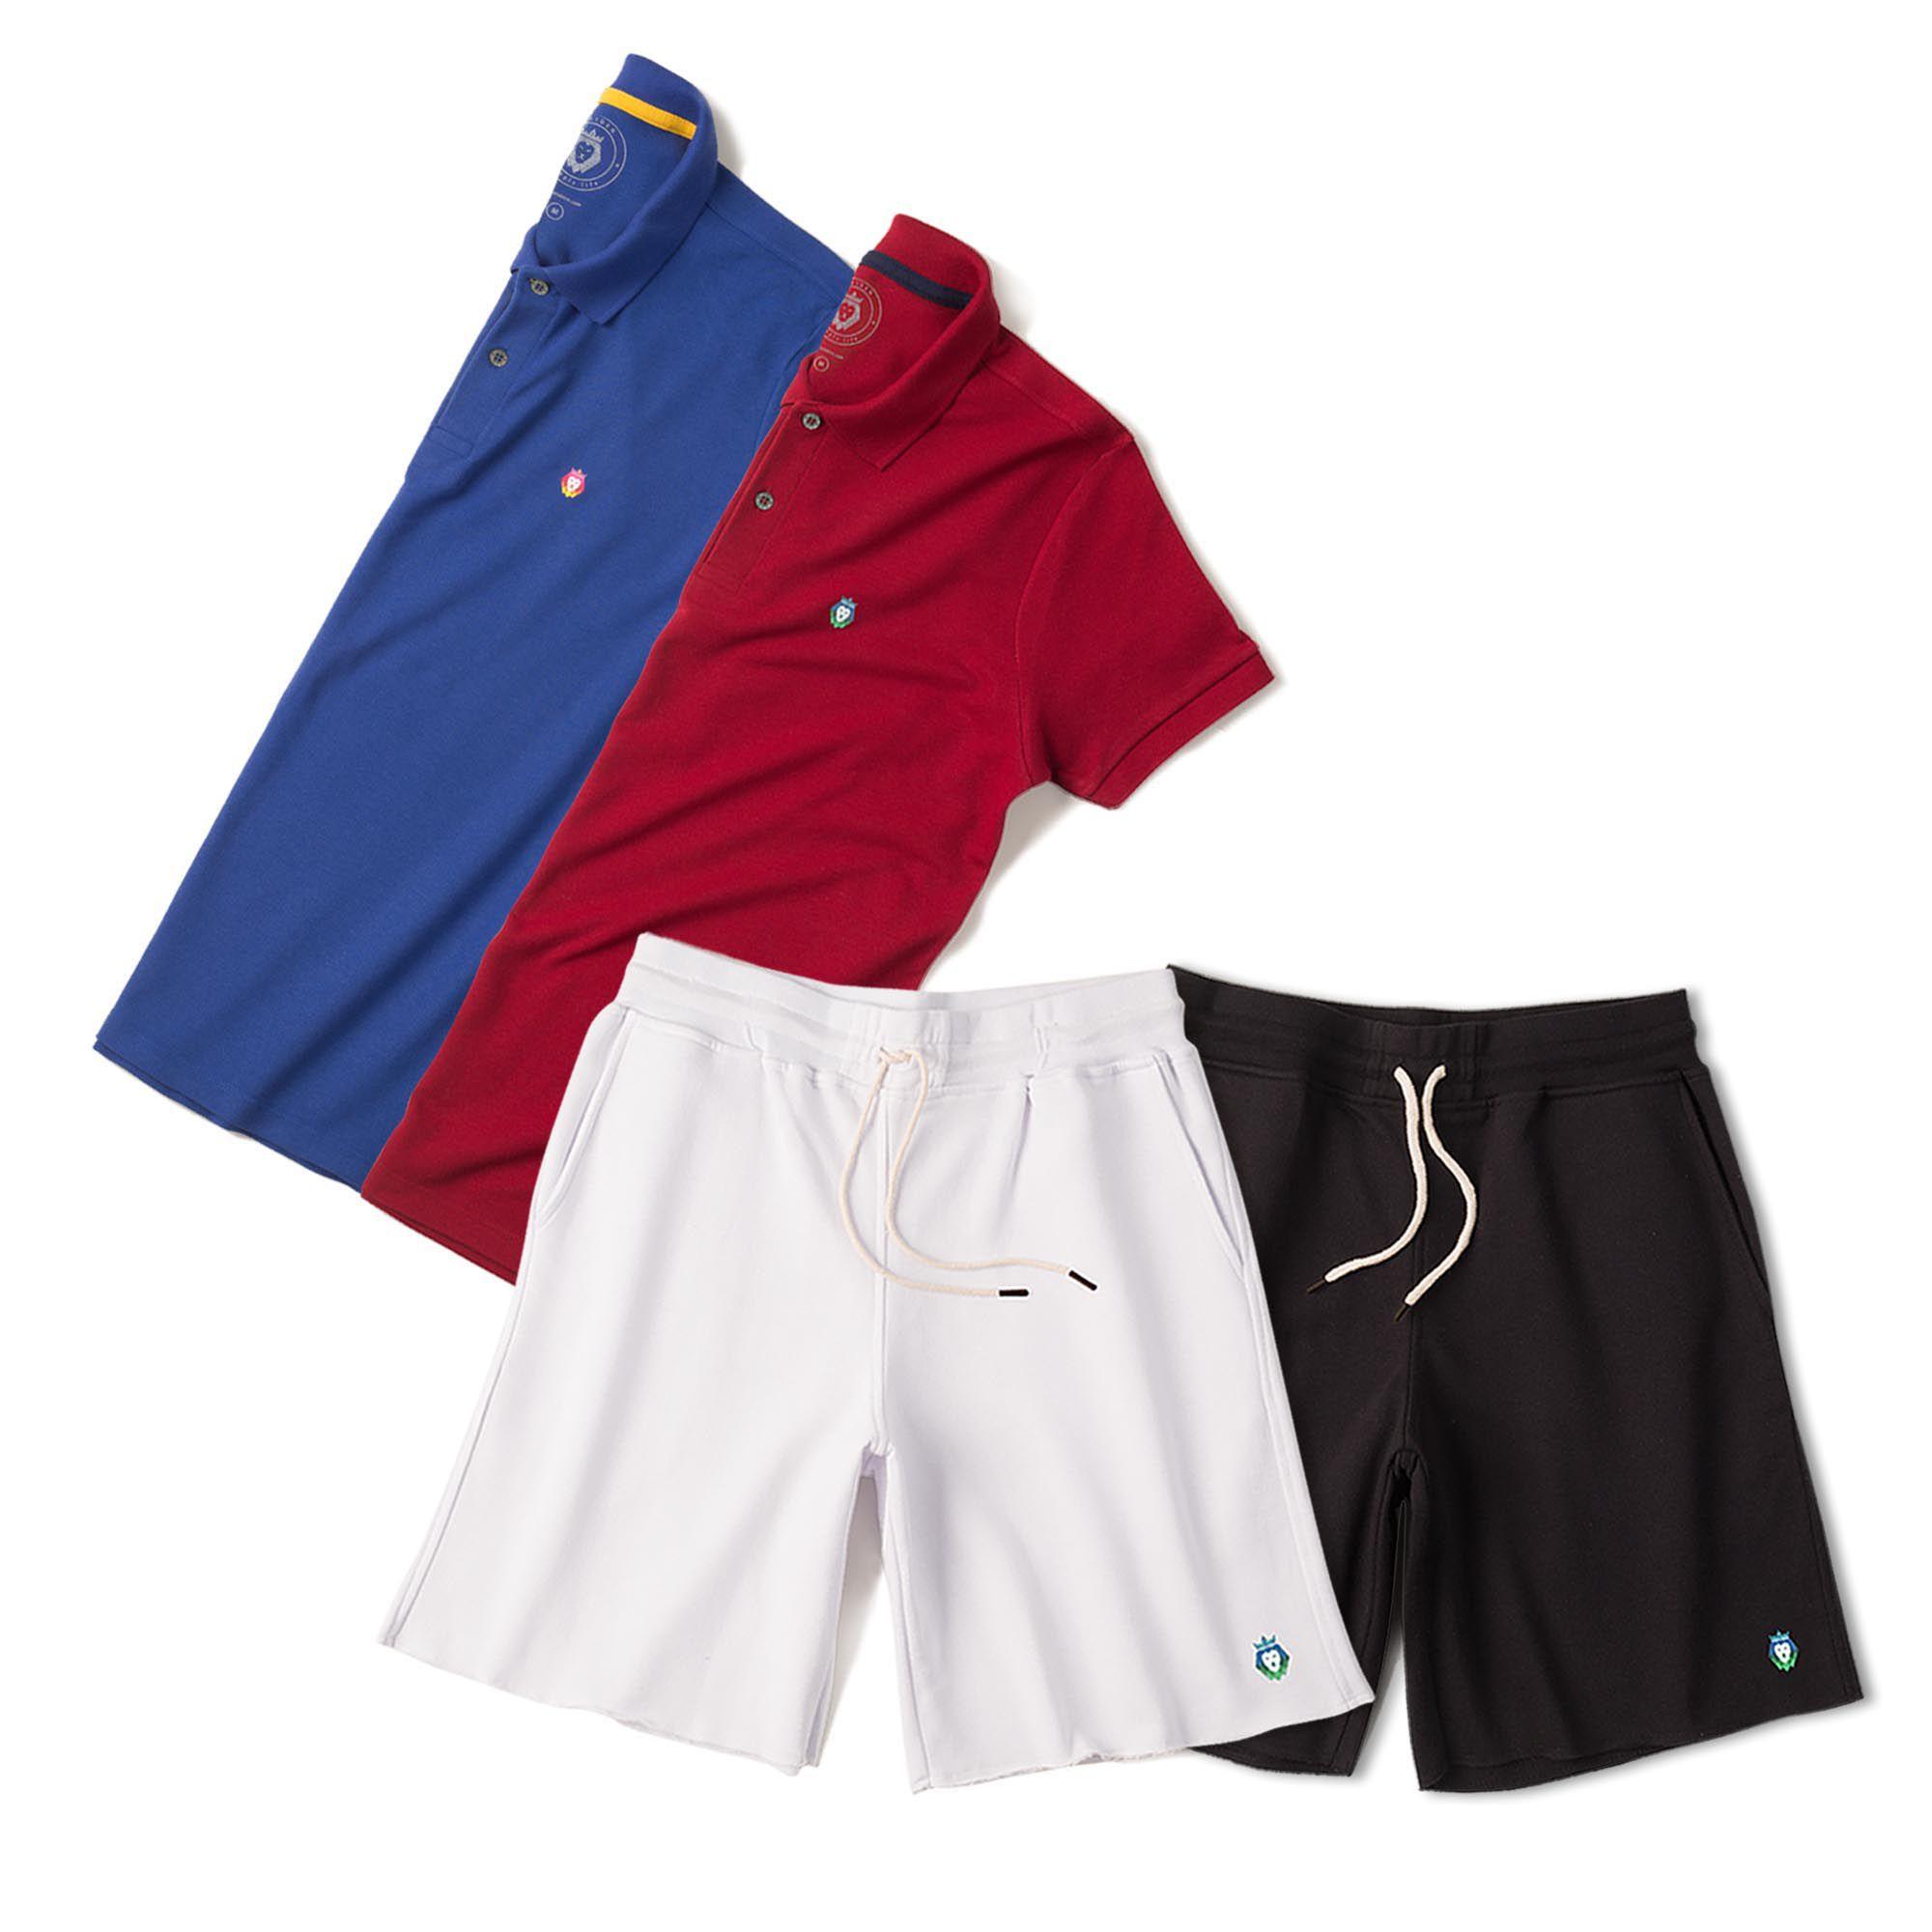 Kit 2 Bermudas Basic Preta Branca + 2 Camisas Polo Style Royal Bordô Zaiden Masculina